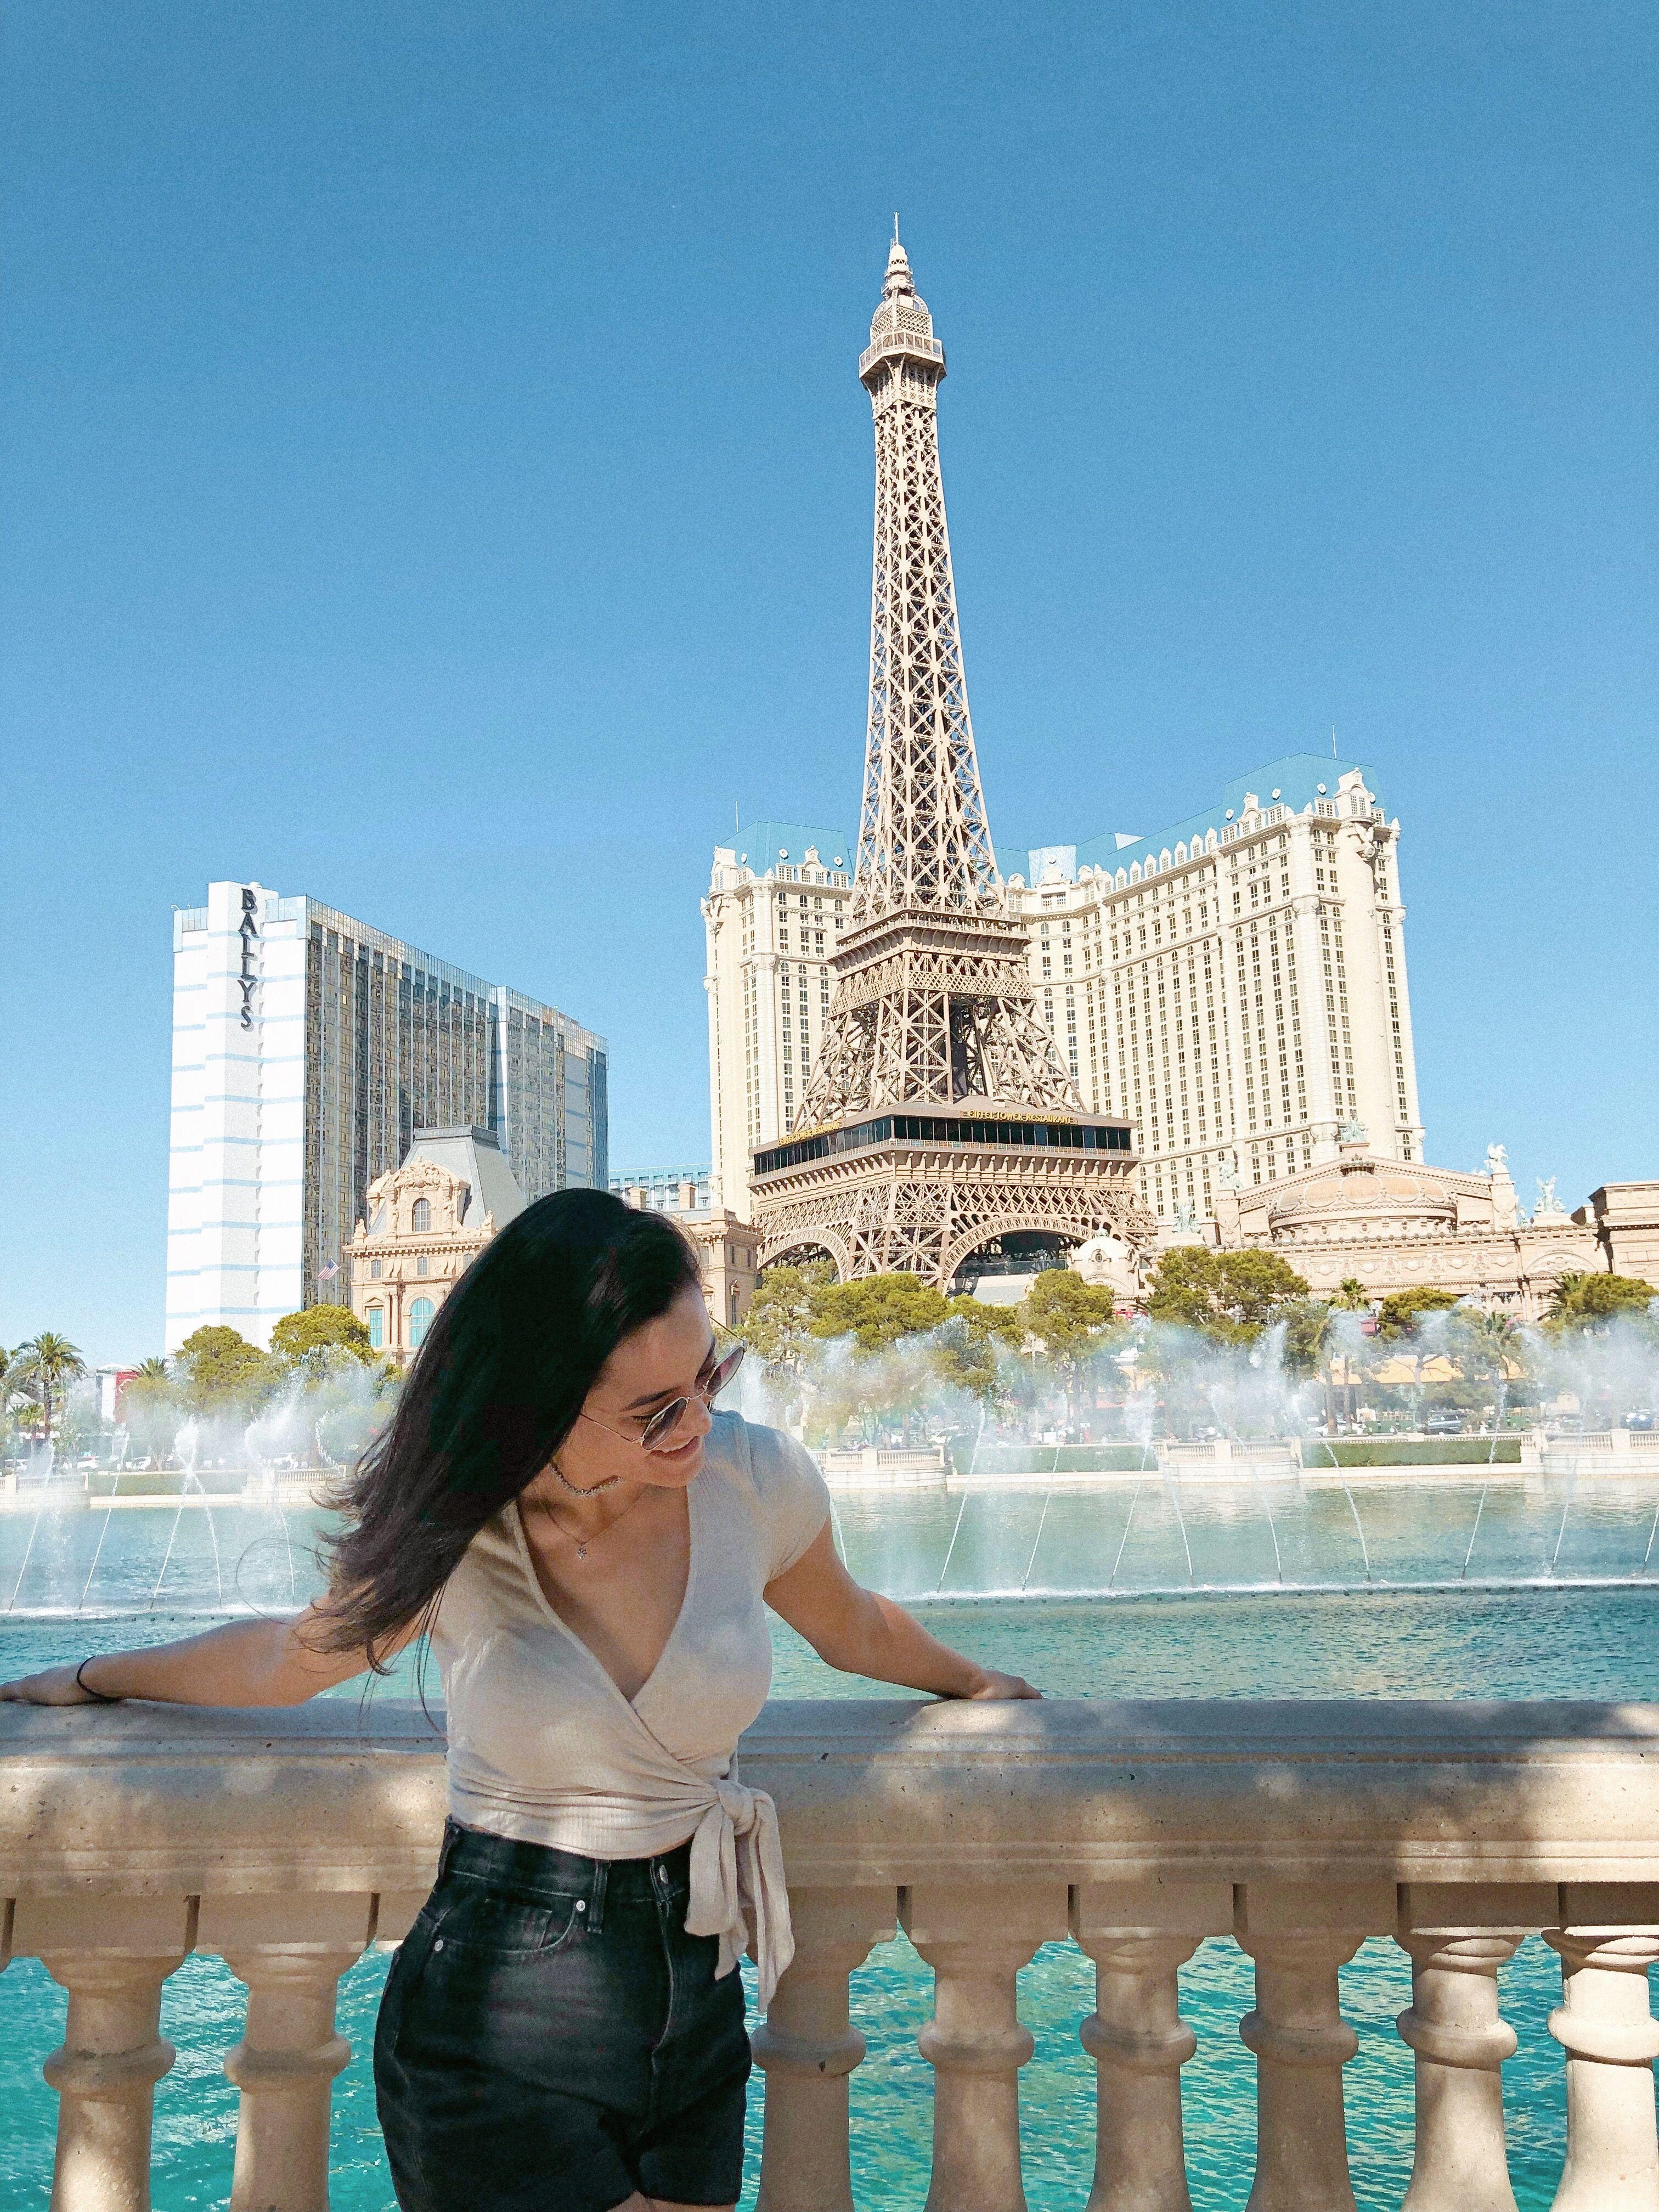 Instagram Las Vegas Vacation: #lasvegas #tumblr #instagram #photooftheday